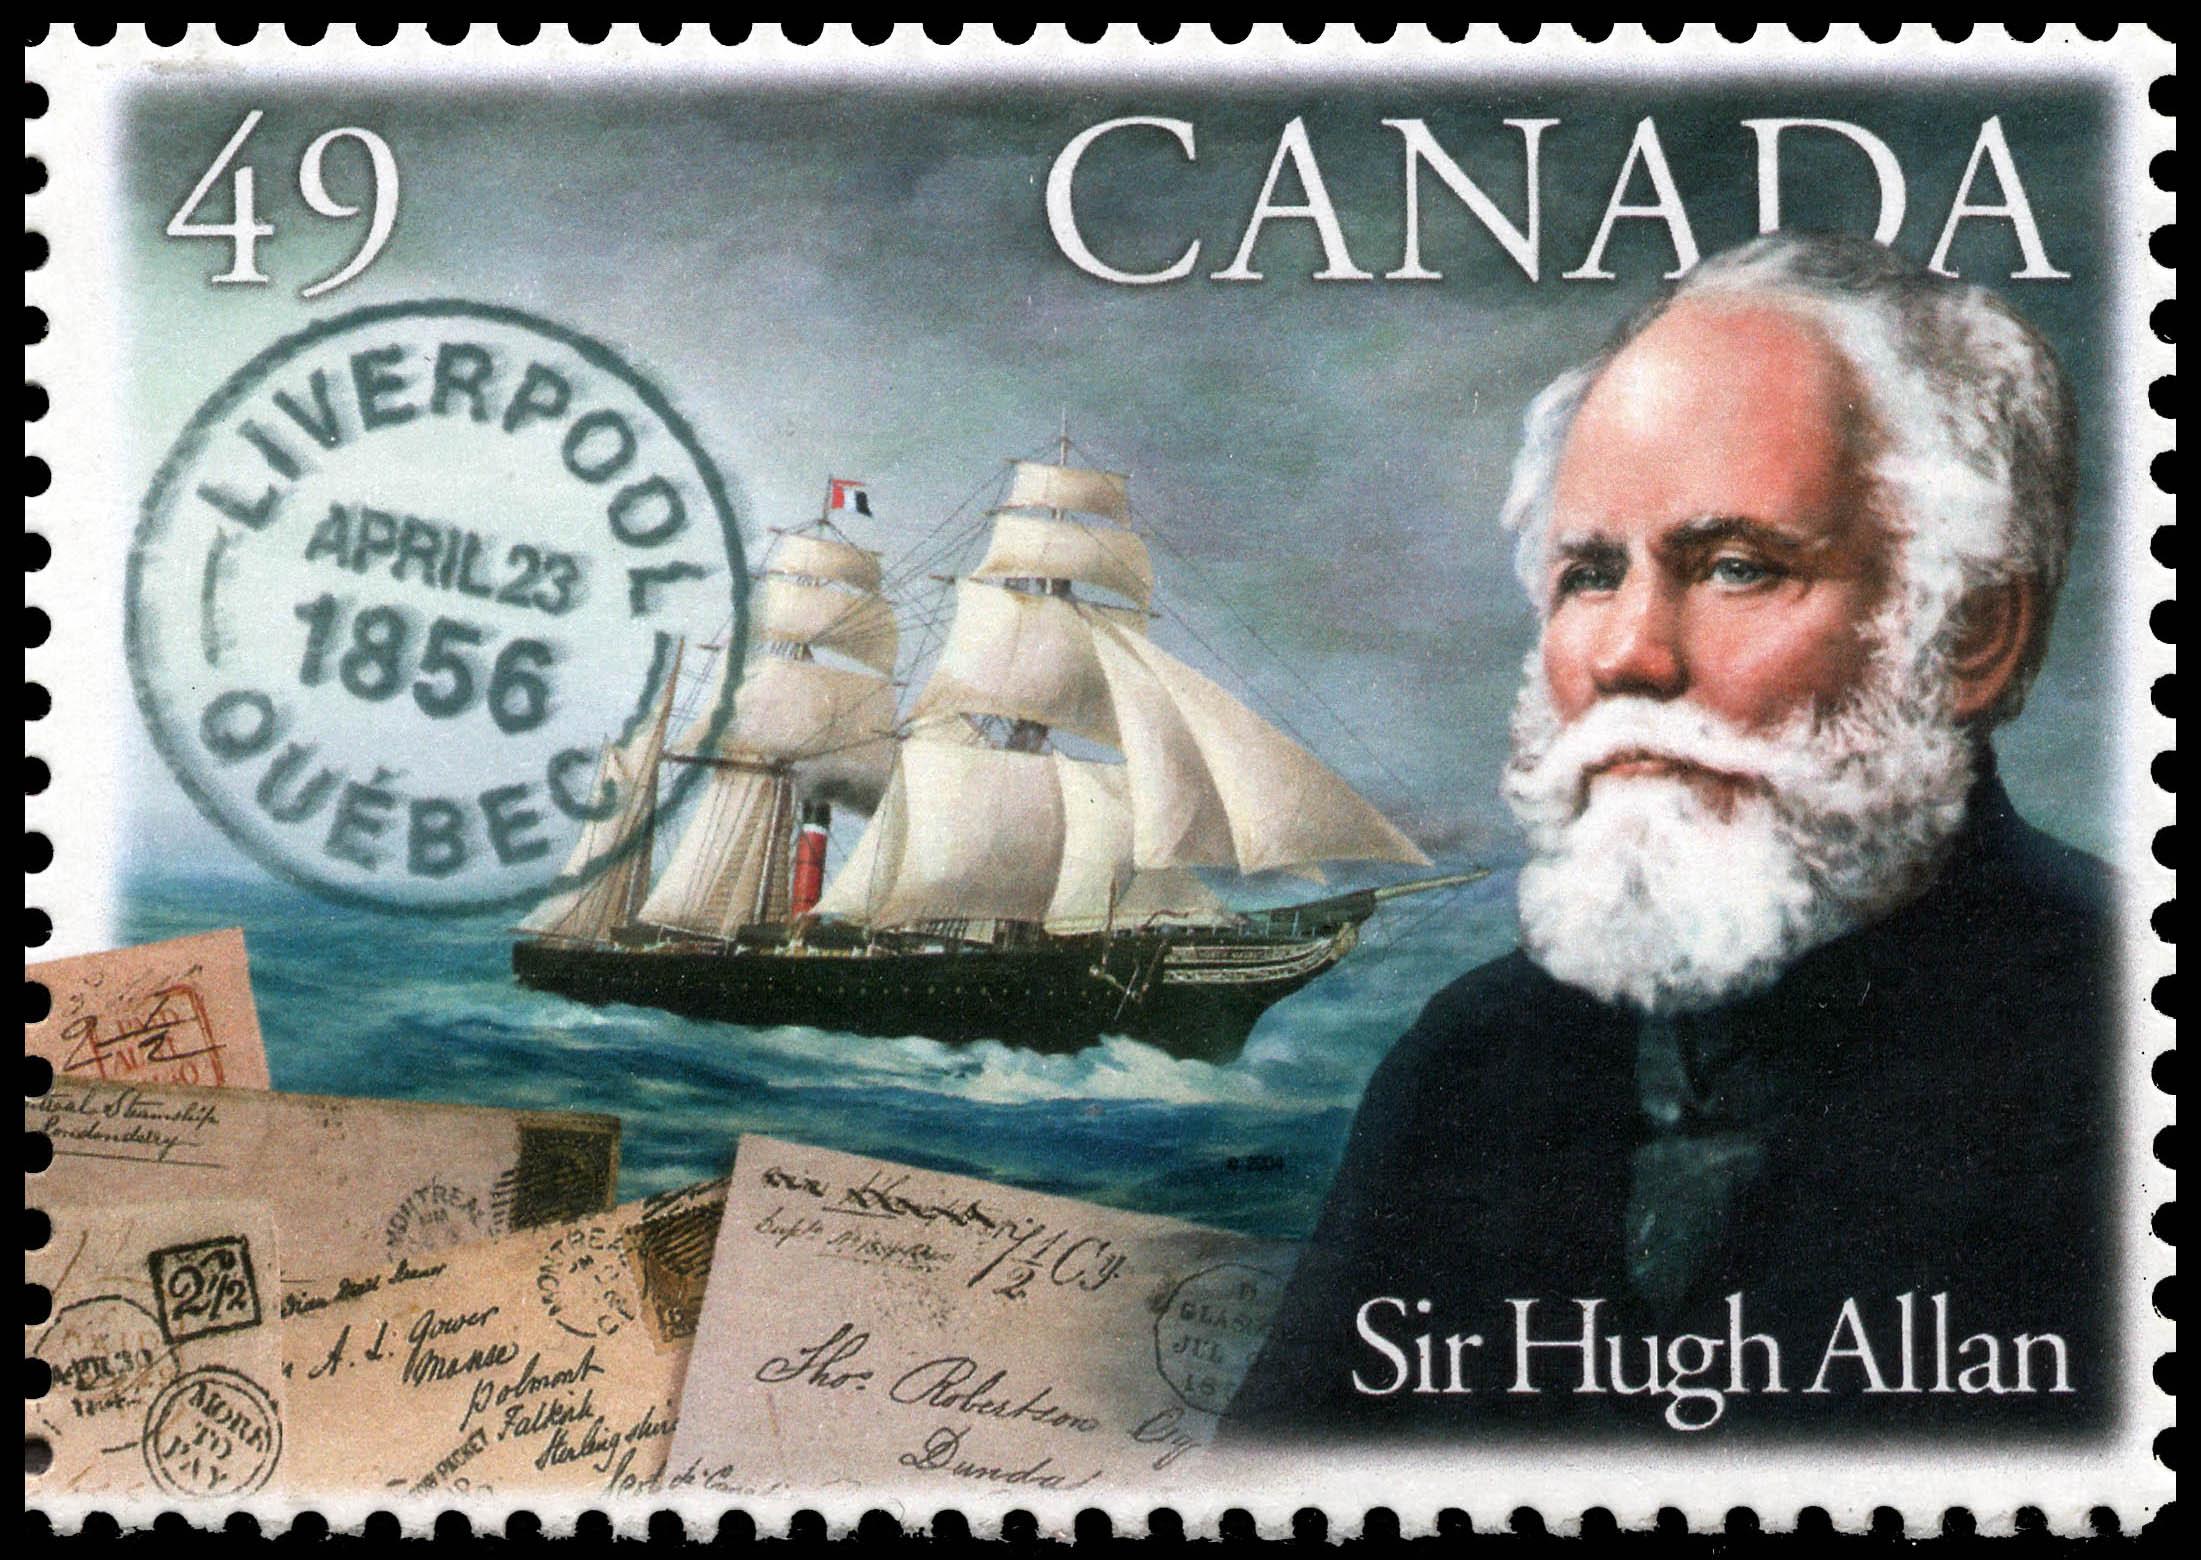 Sir Hugh Allan Canada Postage Stamp | Pioneers of Transatlantic Mail Service